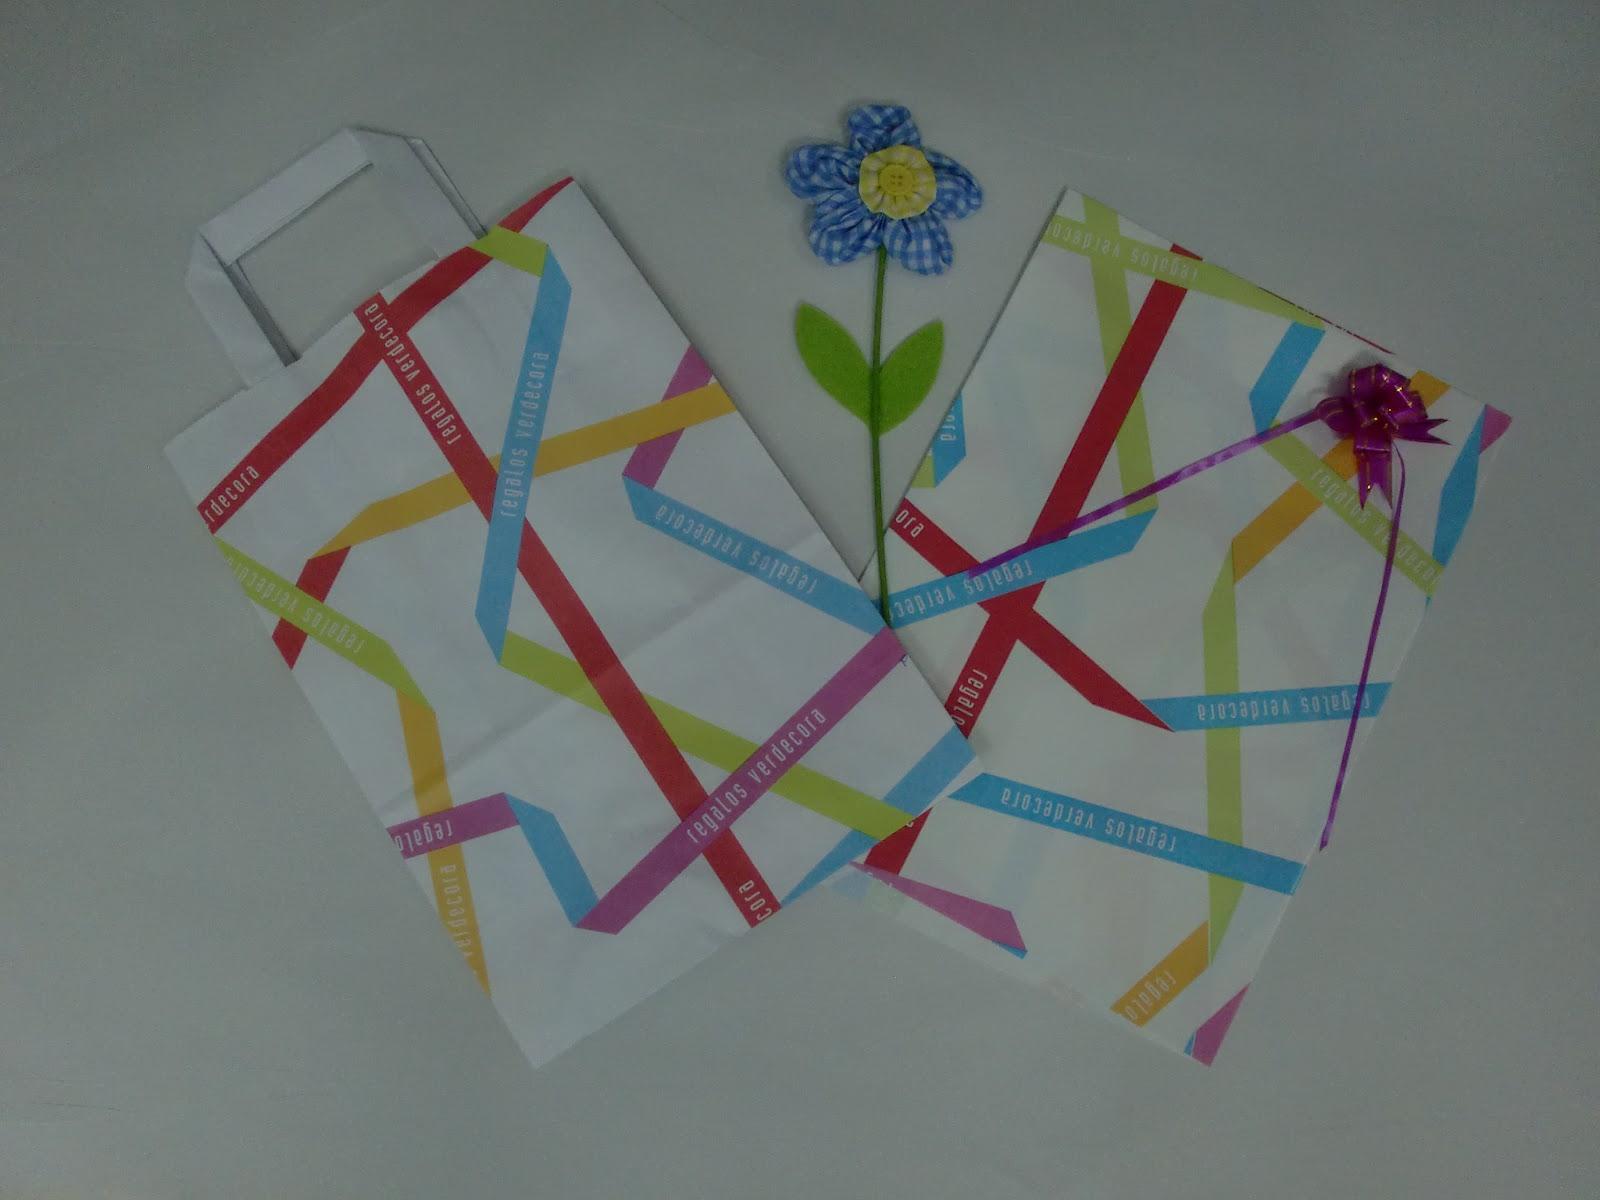 Blog fiesta paper envolvemos ilusiones verdecora papel for Verdecora paterna